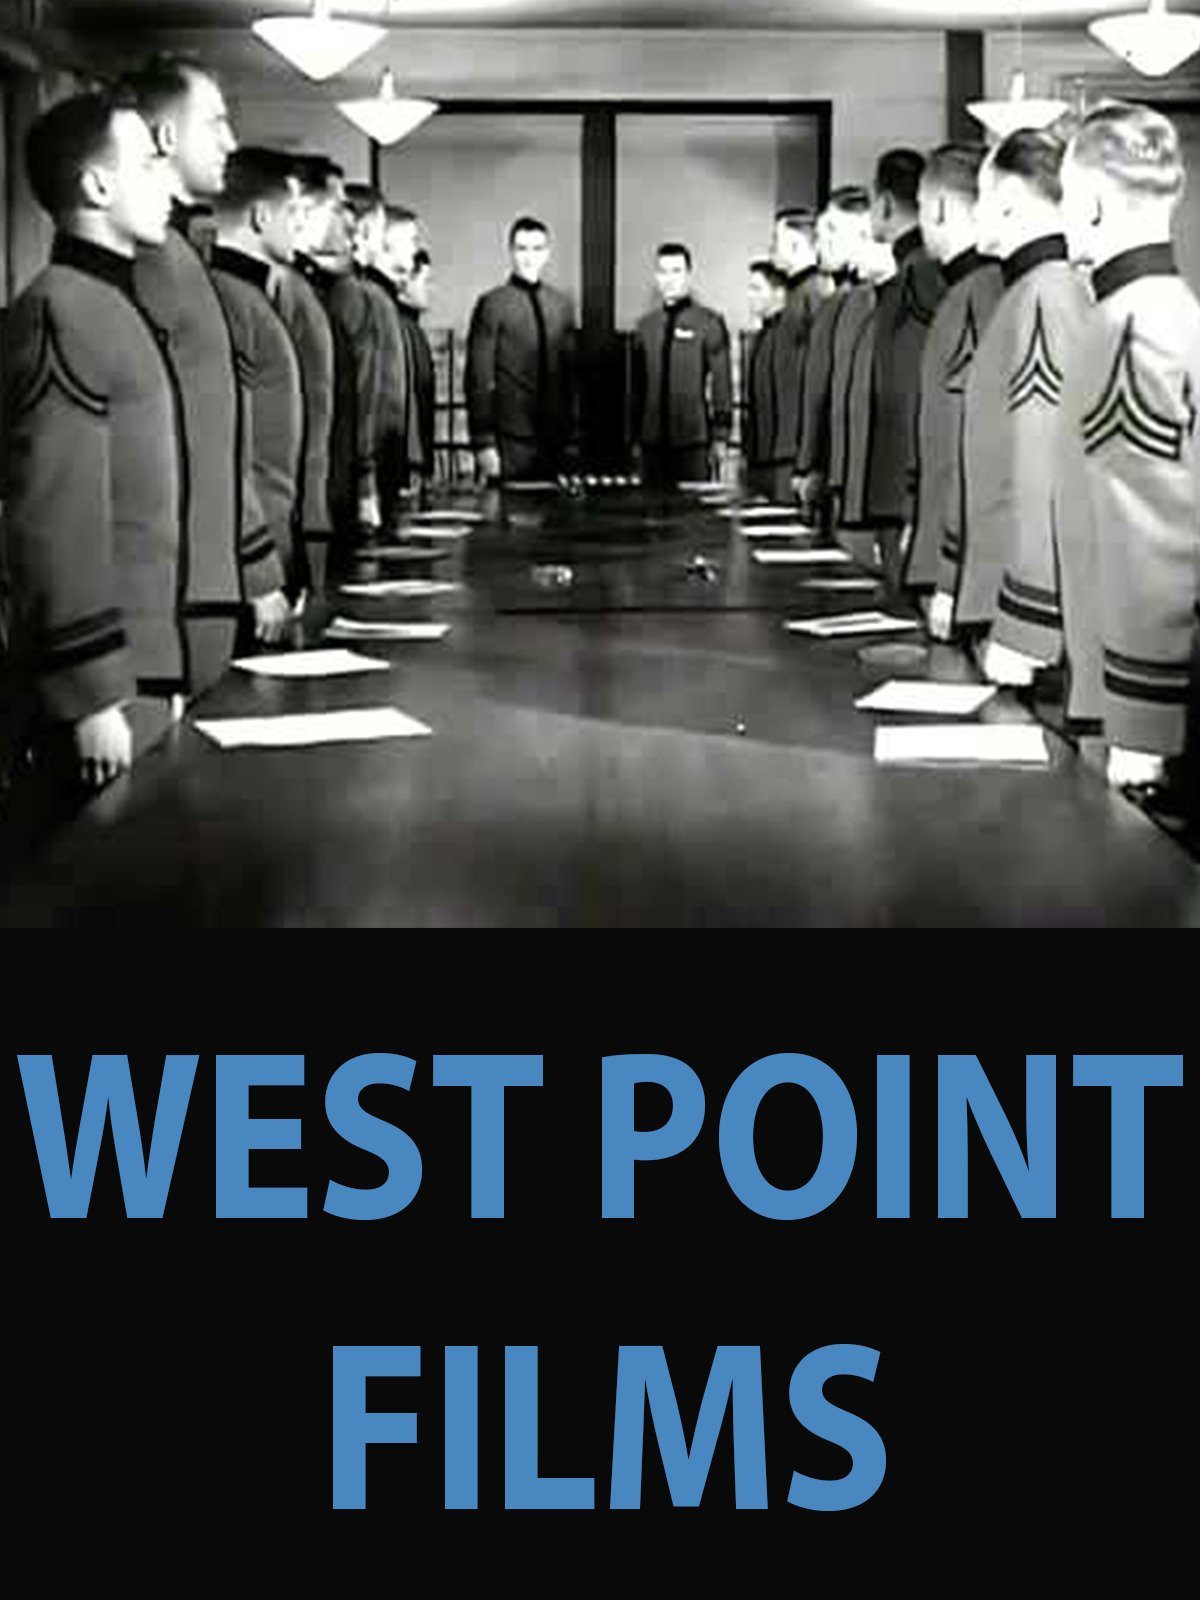 West Point Films